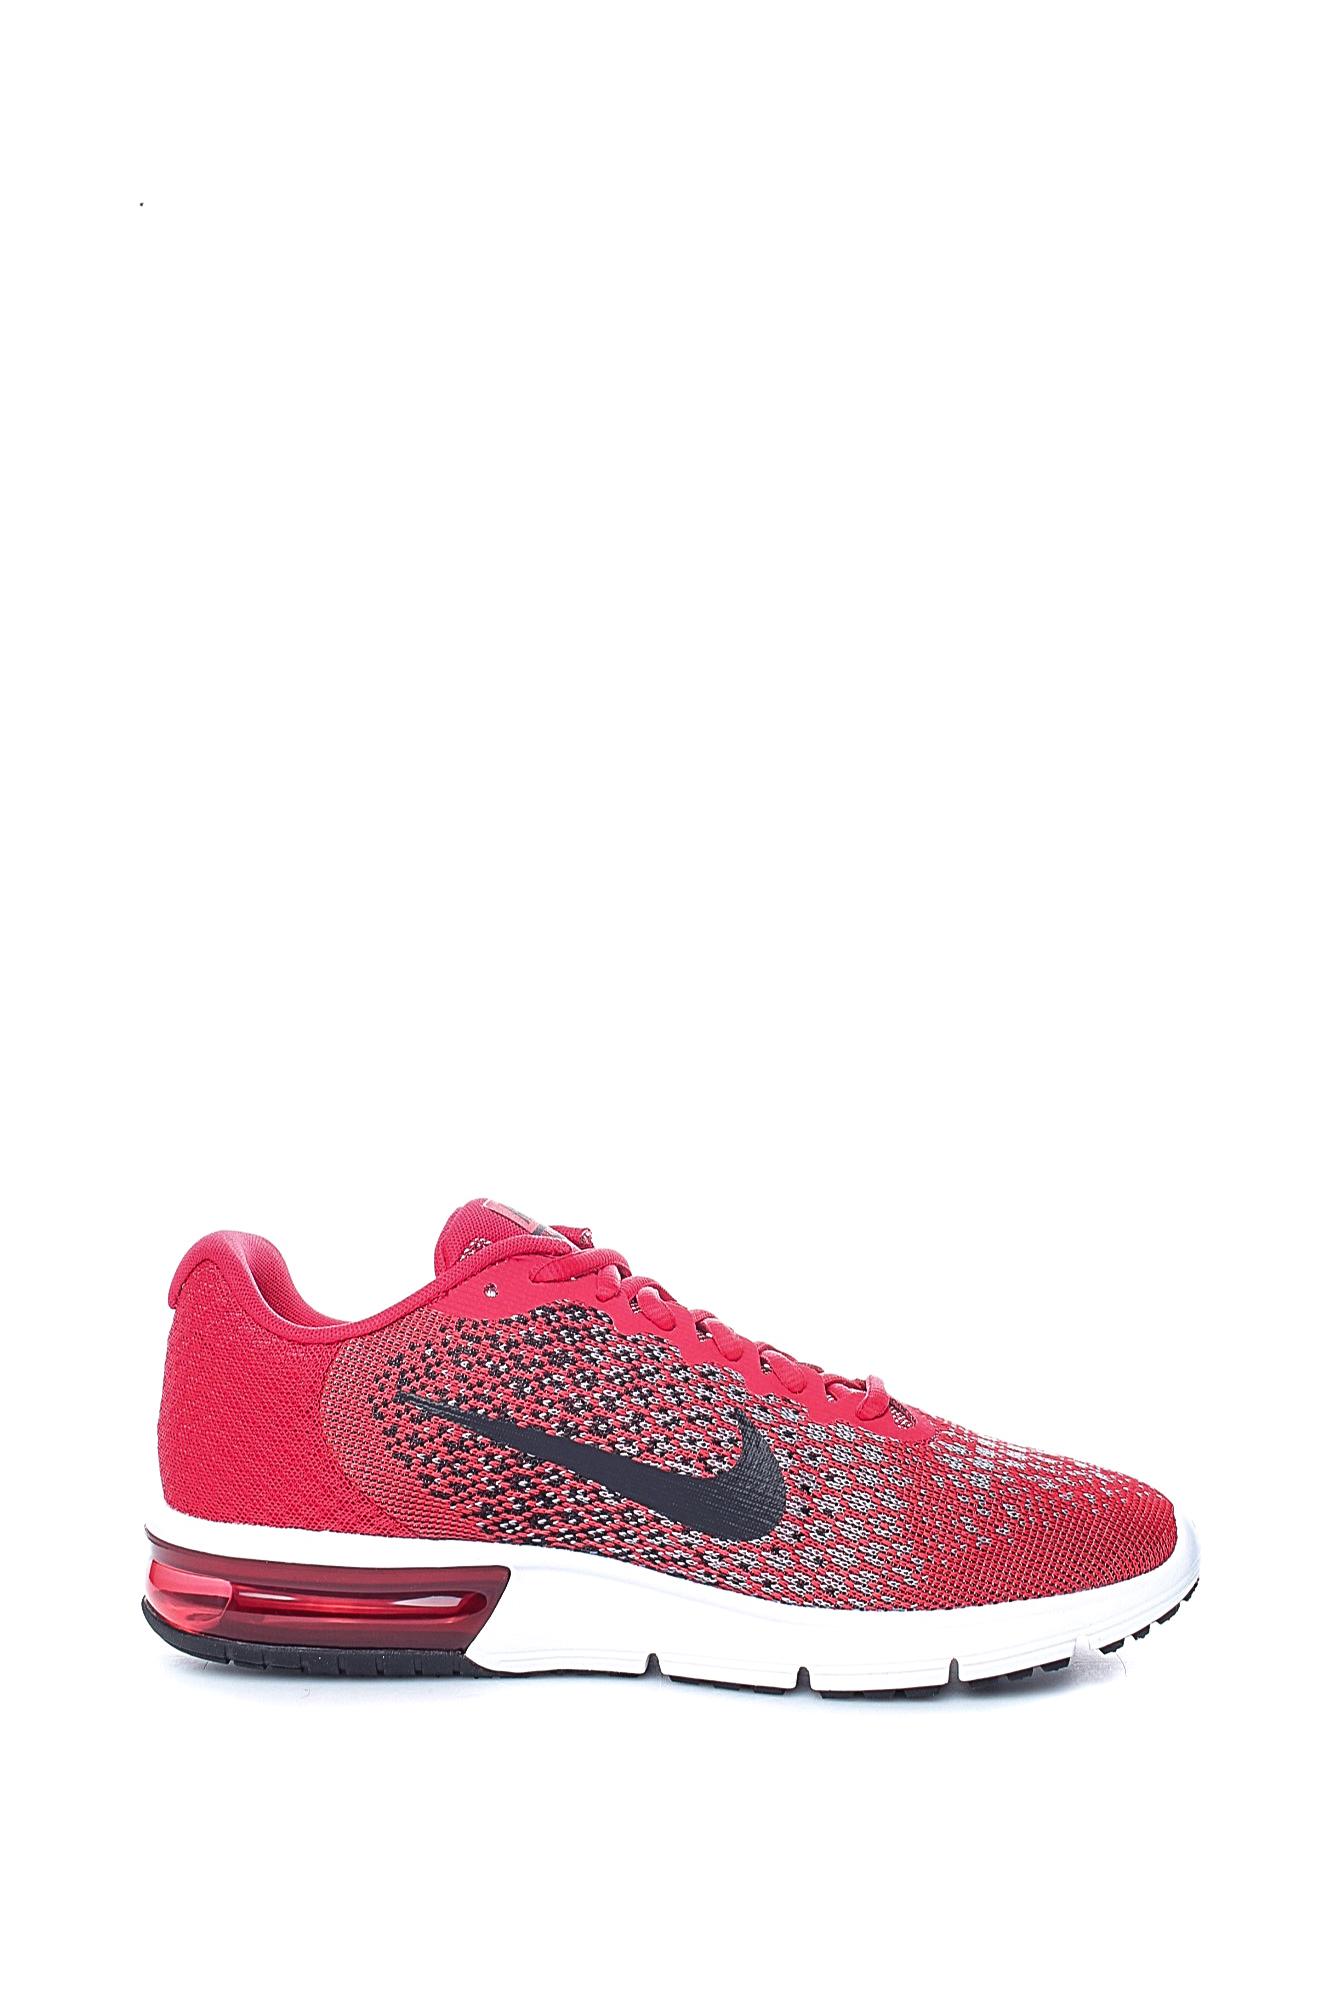 NIKE – Ανδρικά παπούτσια για τρέξιμο Nike Air Max Sequent 2 κόκκινα.  Factoryoutlet ccd8385a0b4